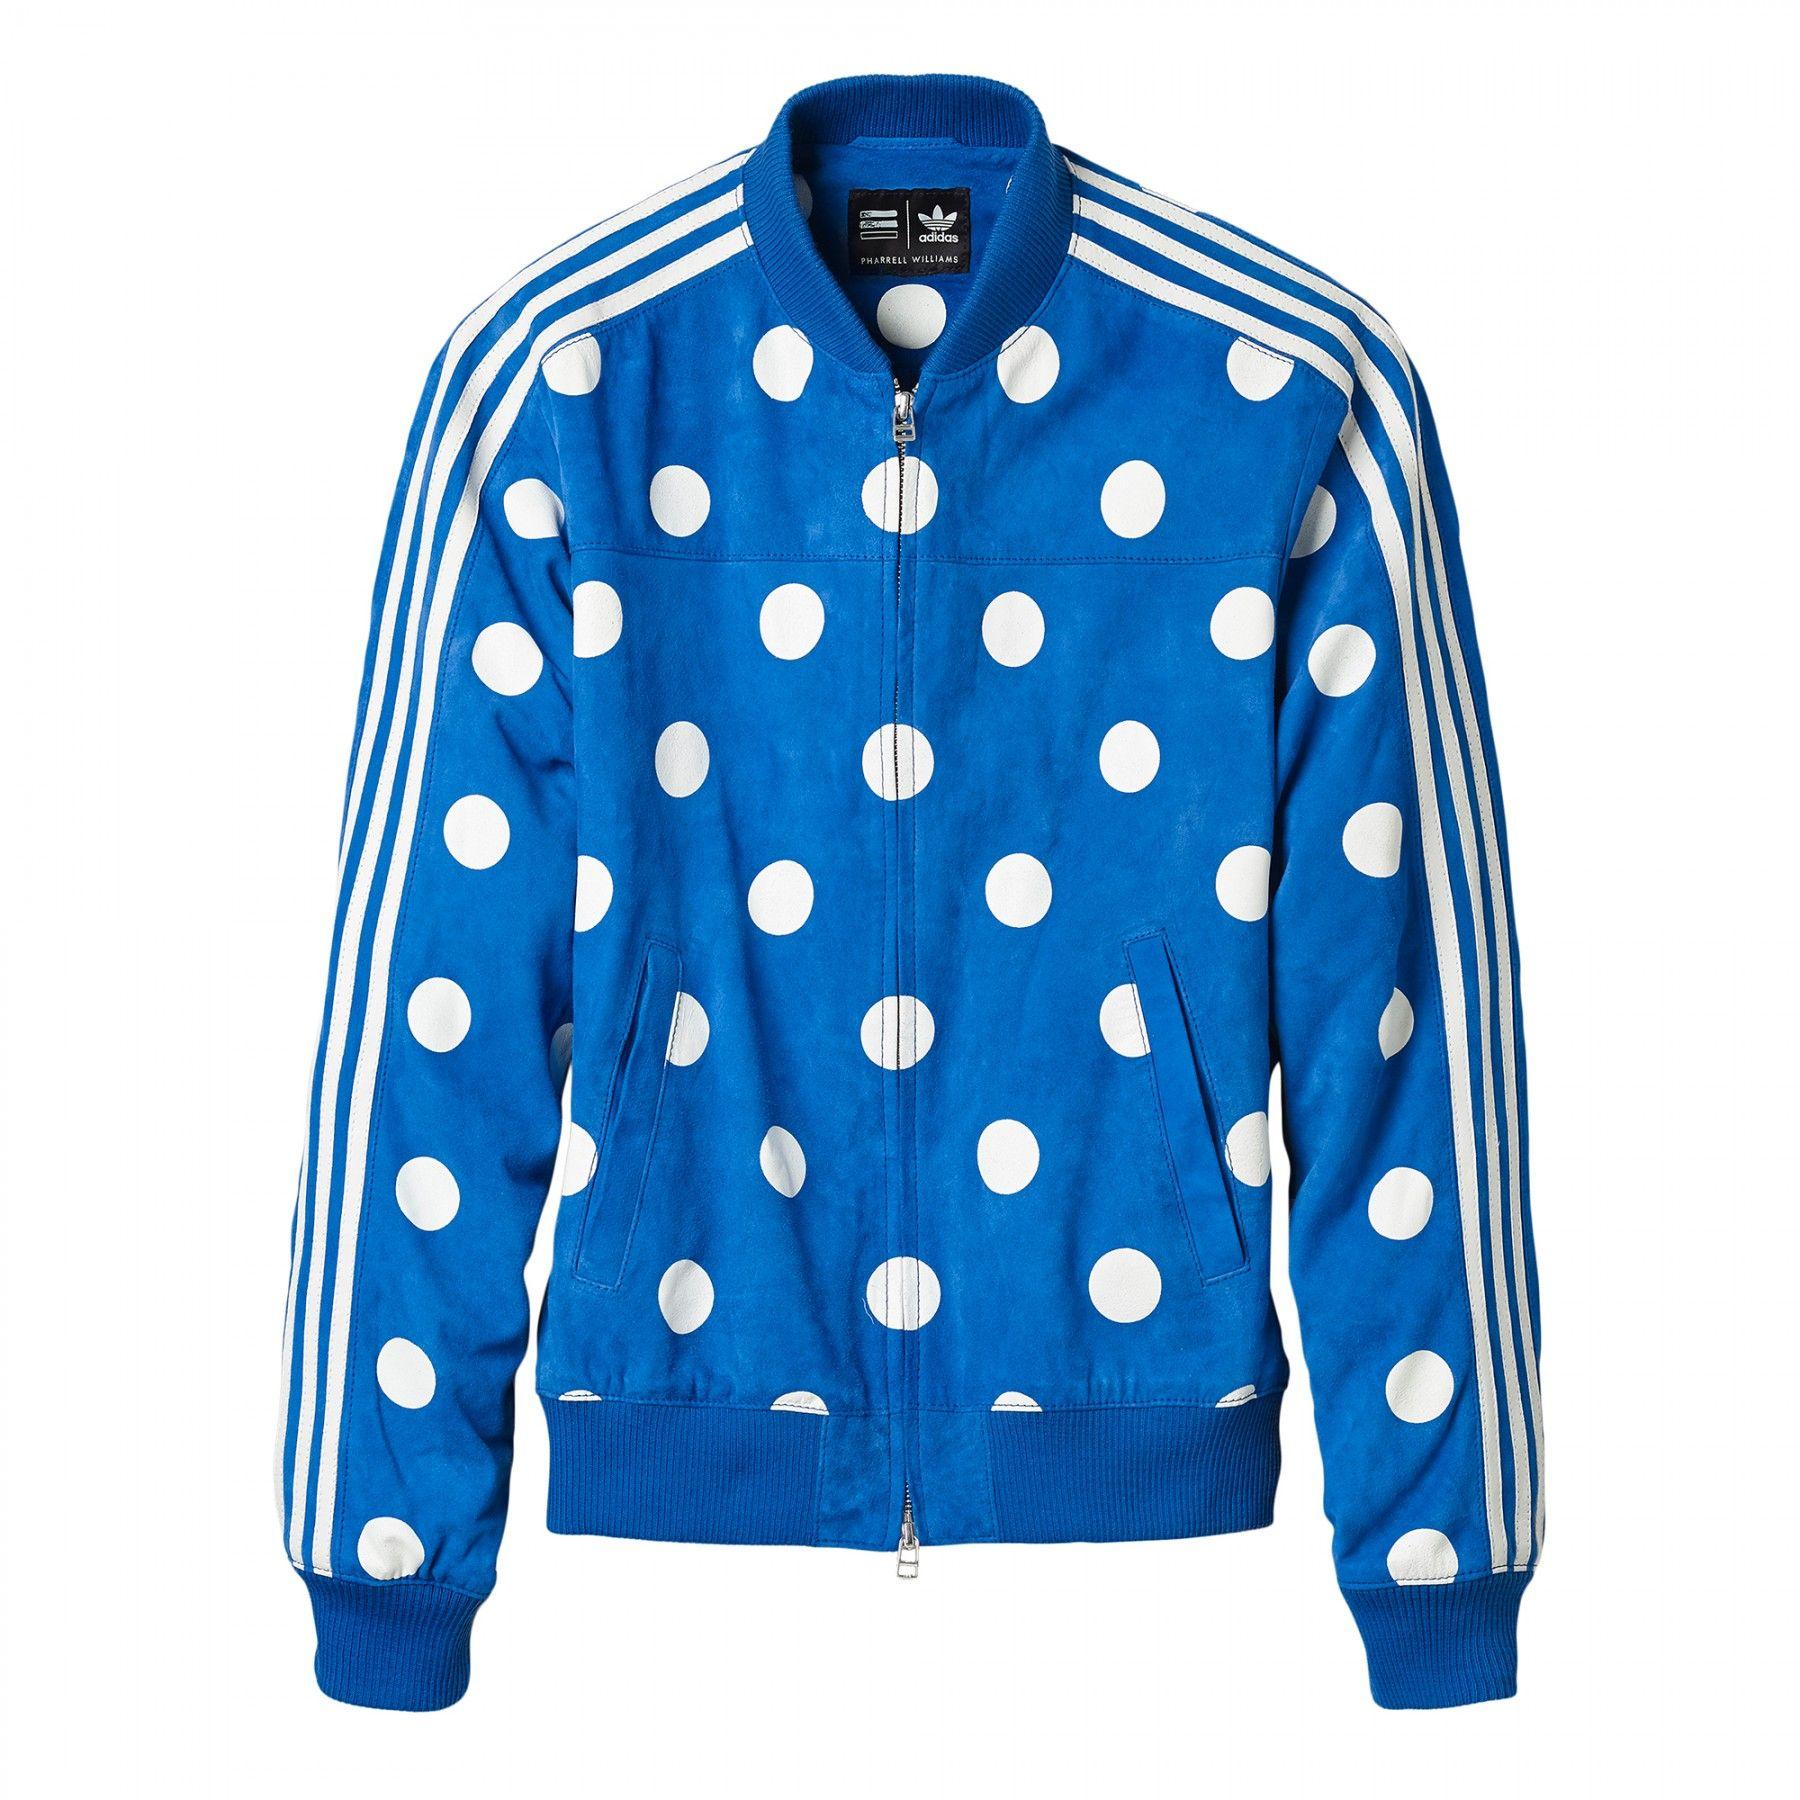 Adidas x Pharrell Williams Leather Jacket (Blue) | Jackets